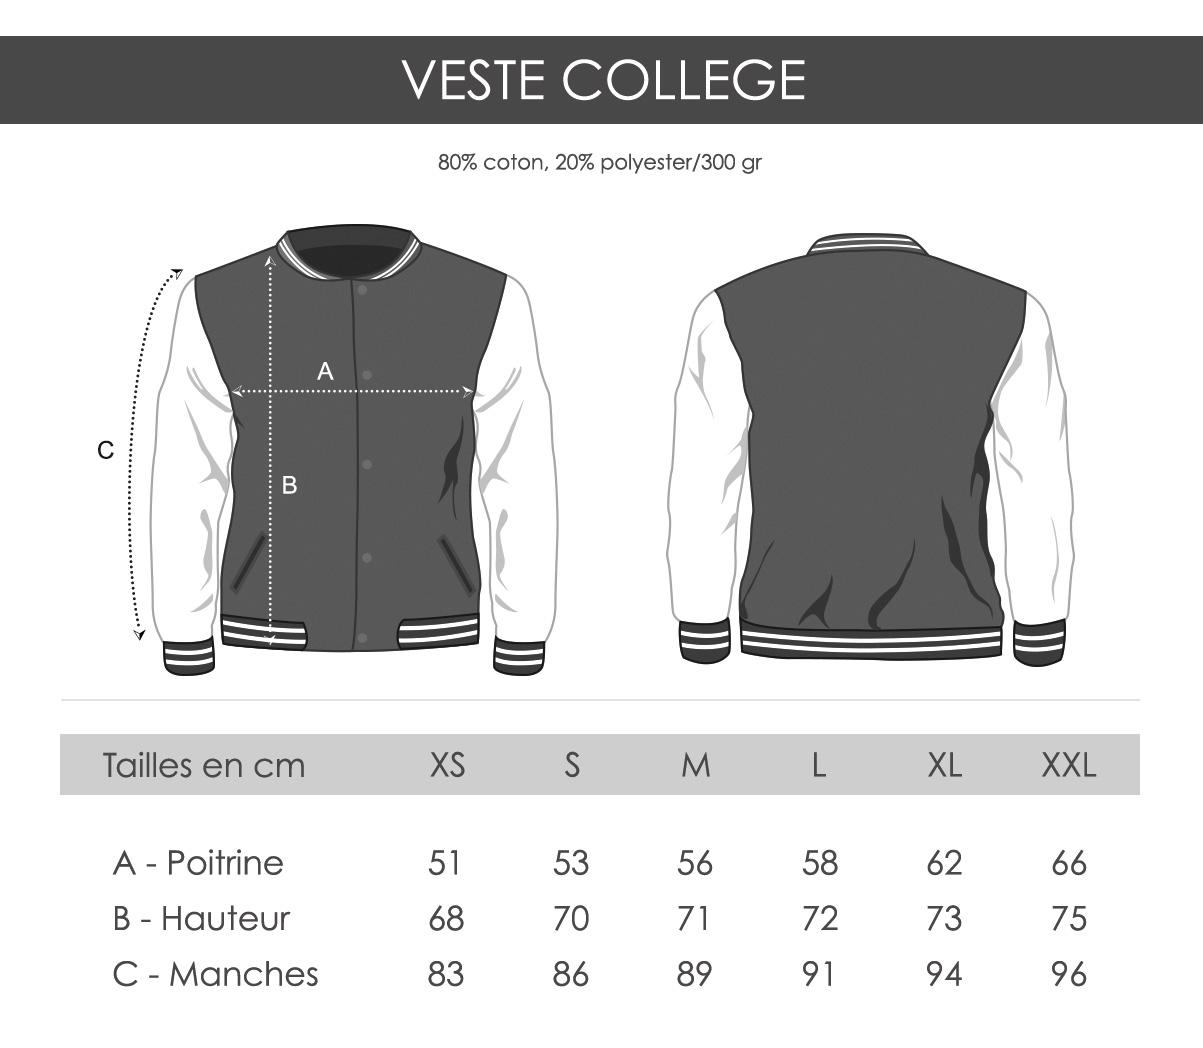 veste_college_18.jpg